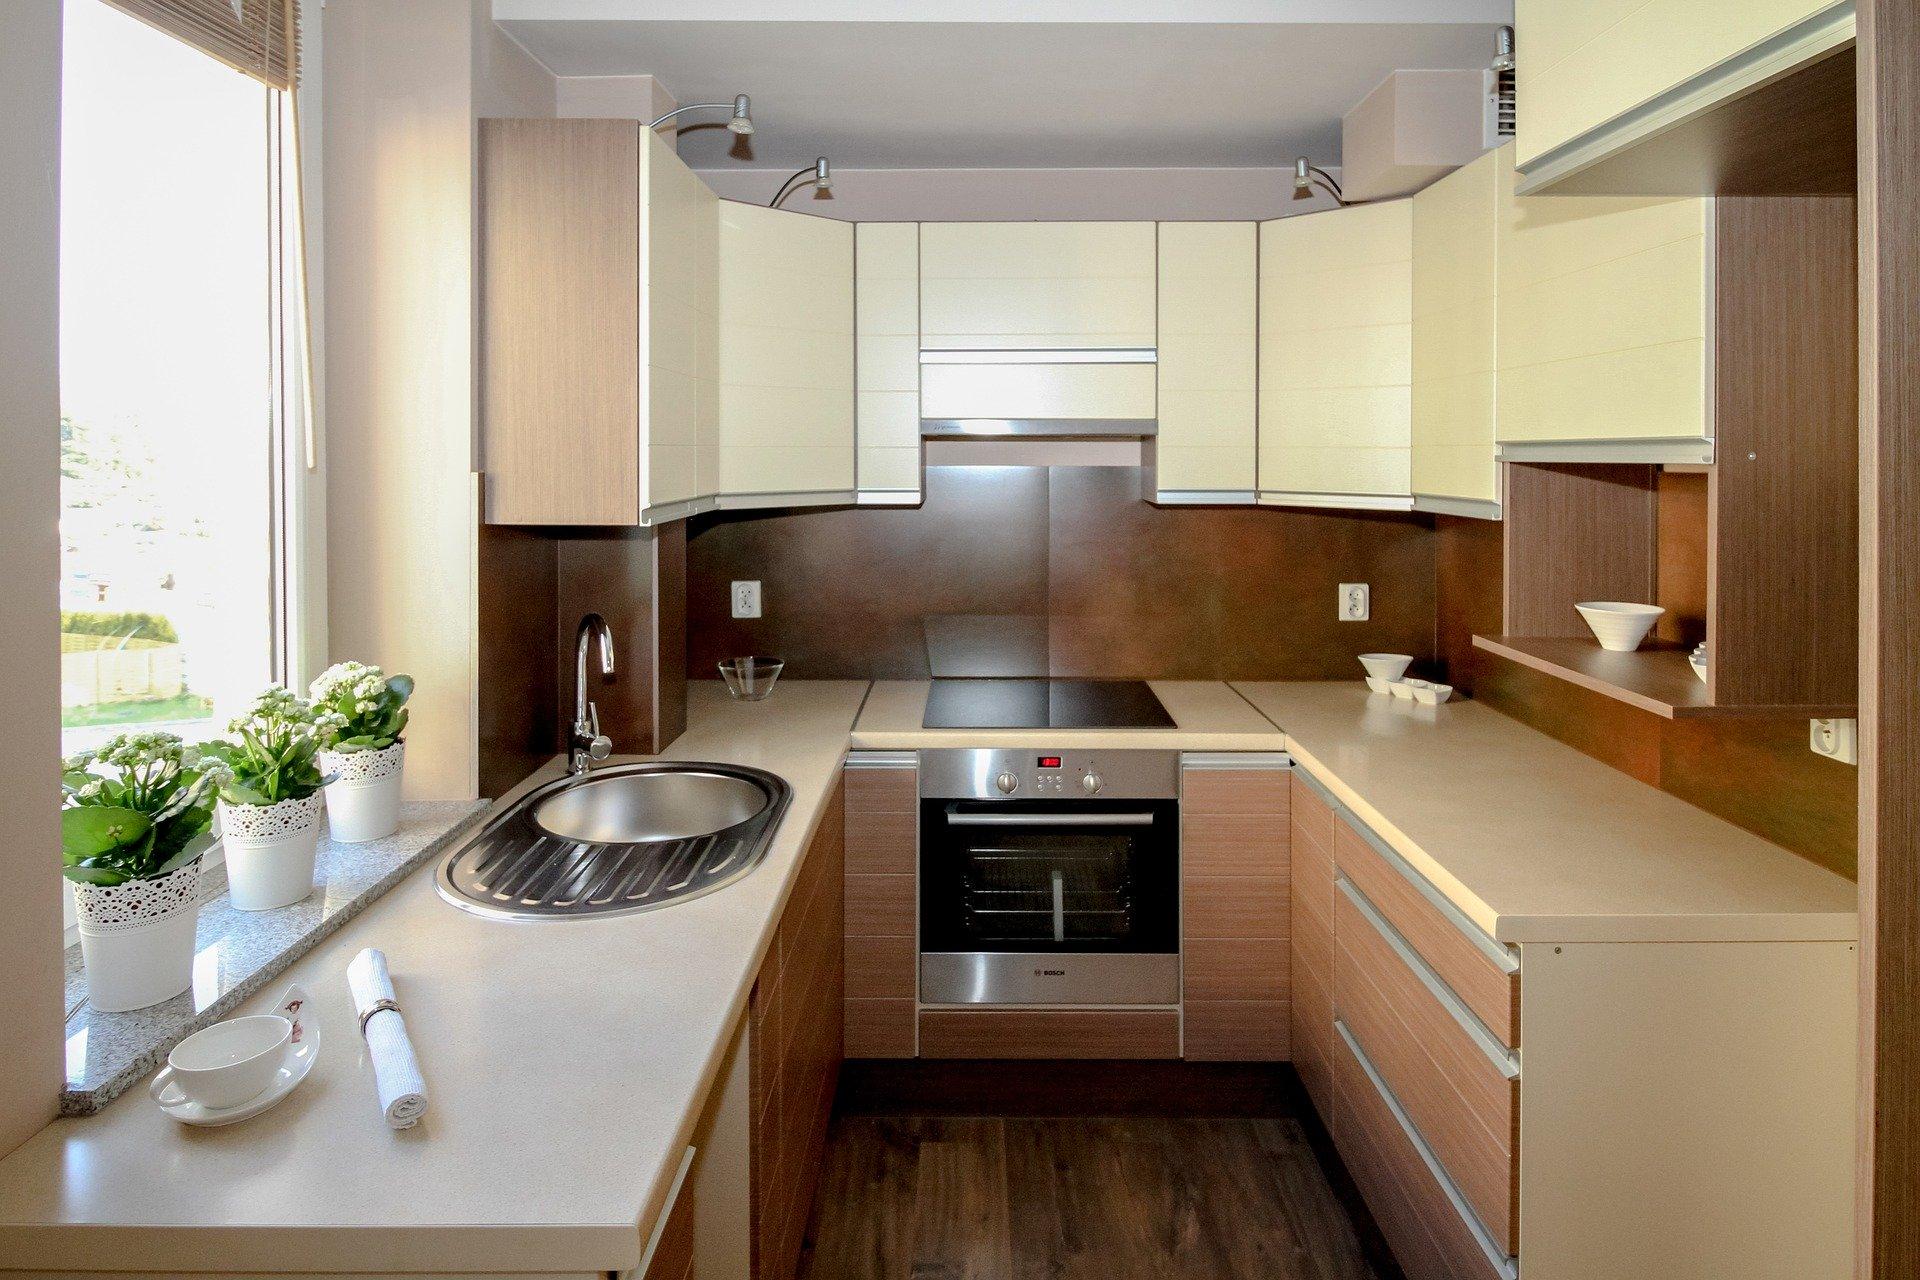 Salon mebli kuchennych i kuchni na wymiar